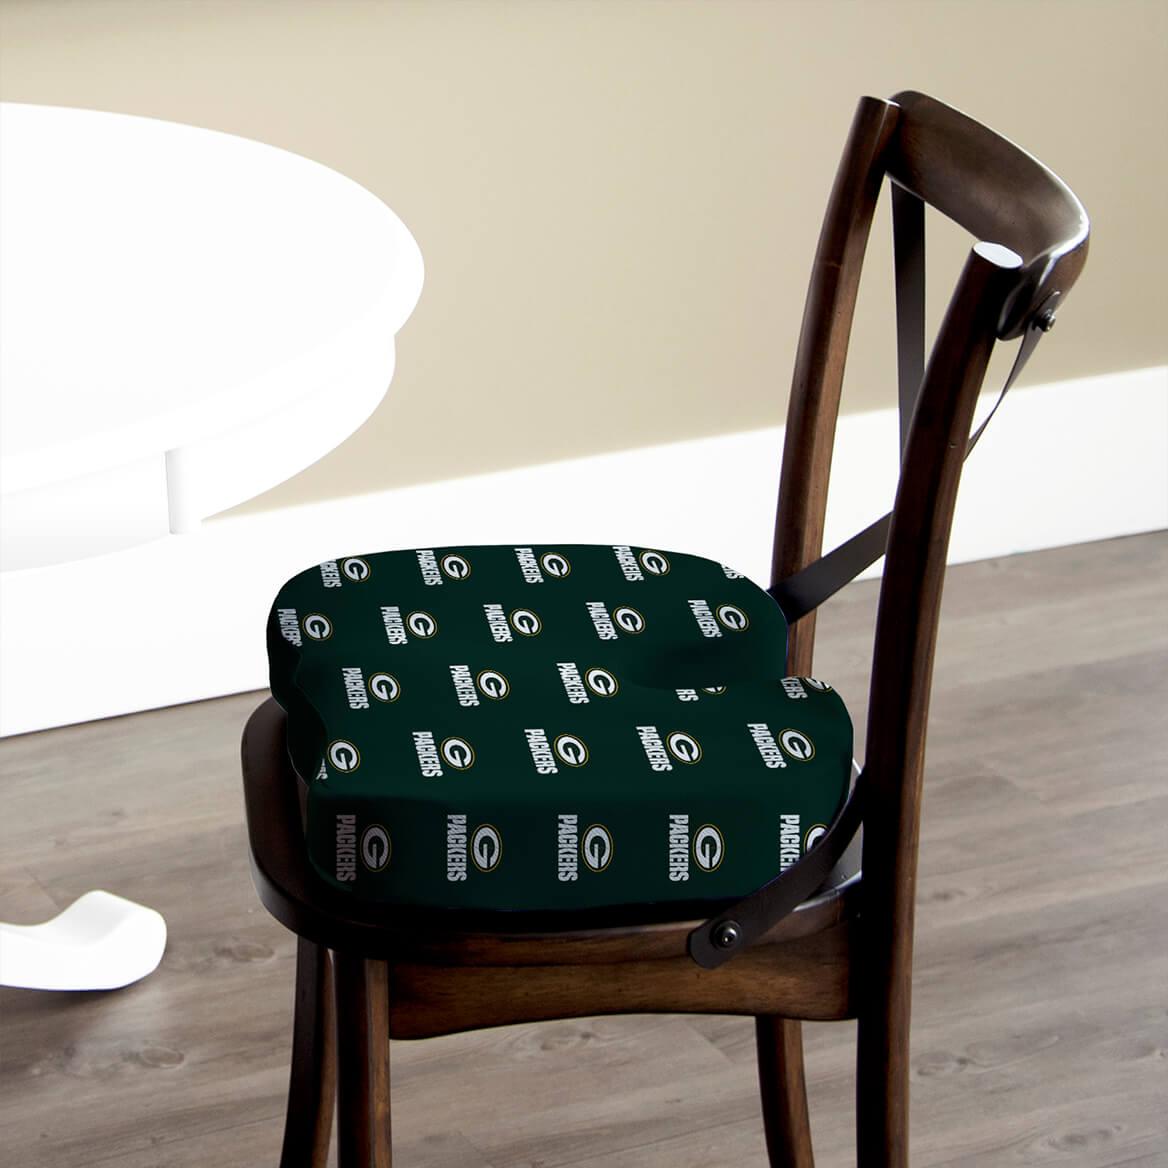 NFL Memory Foam Cushion-364156